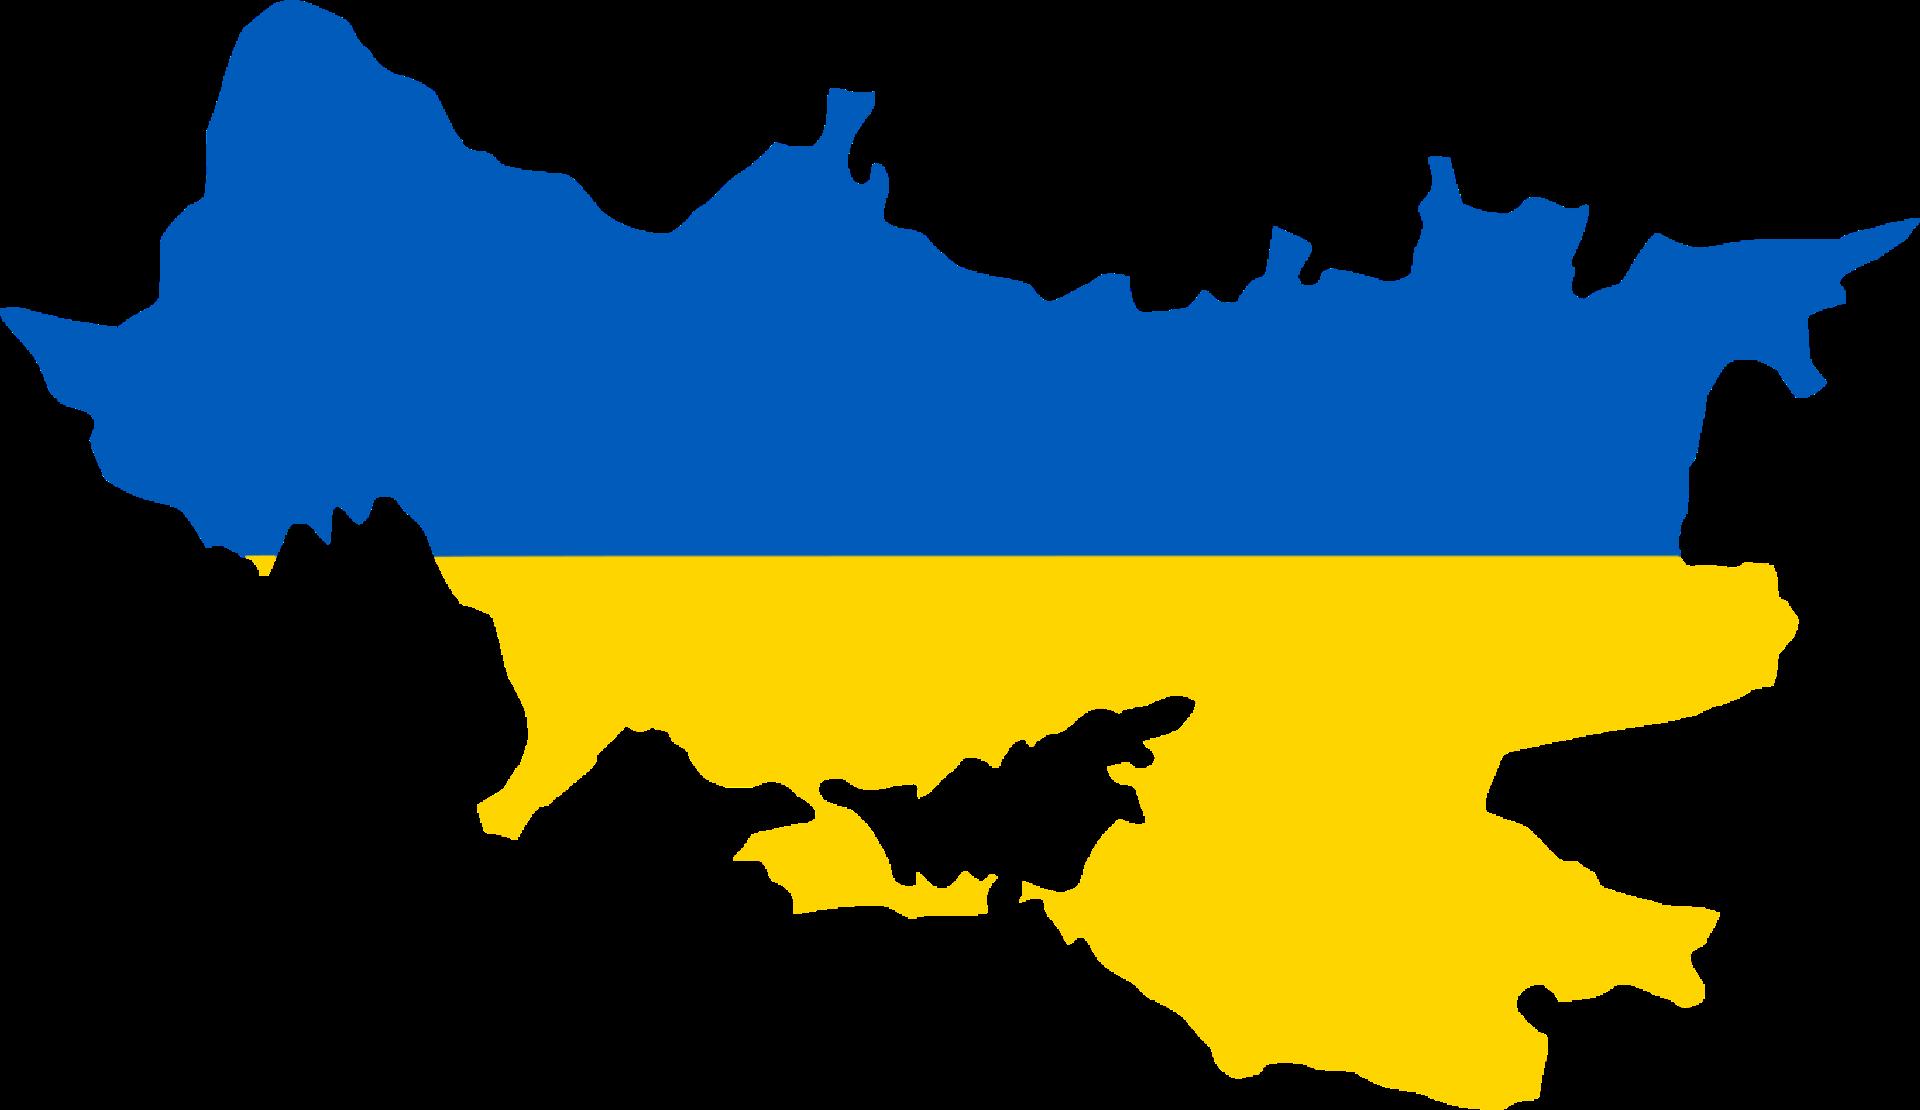 Ukraine PNG-PlusPNG.com-1920 - Ukraine PNG